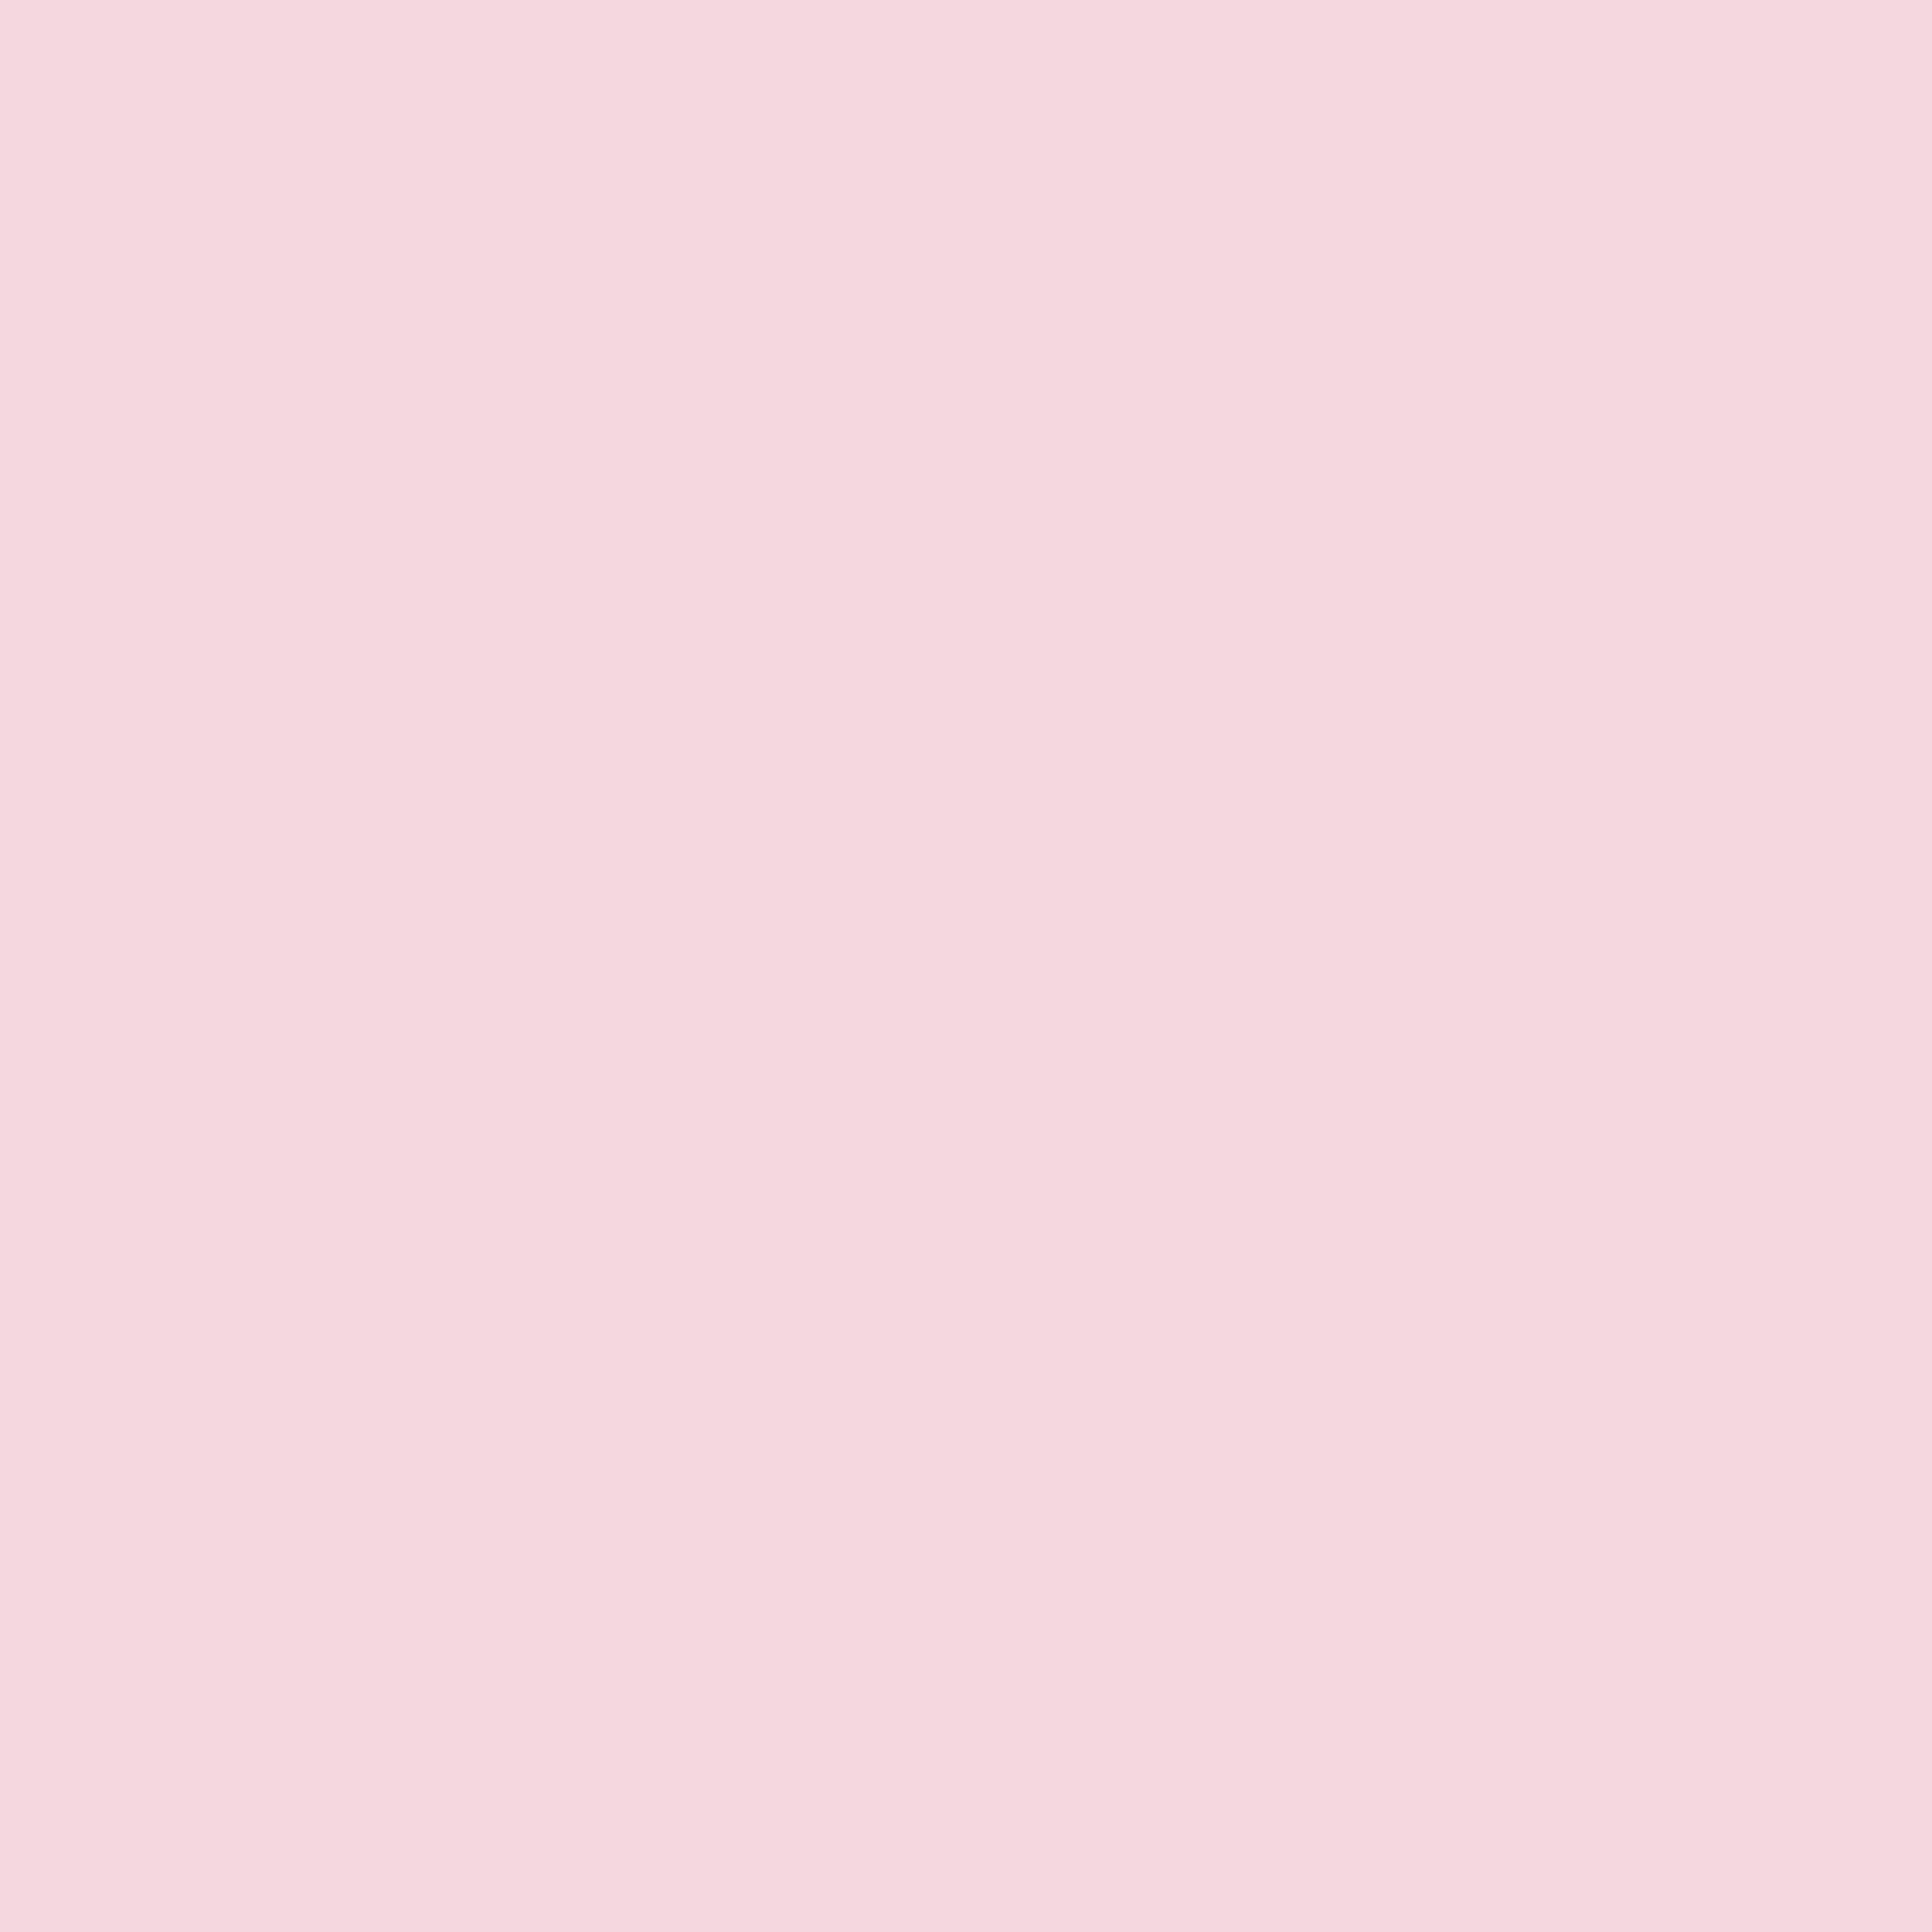 2732x2732 Vanilla Ice Solid Color Background